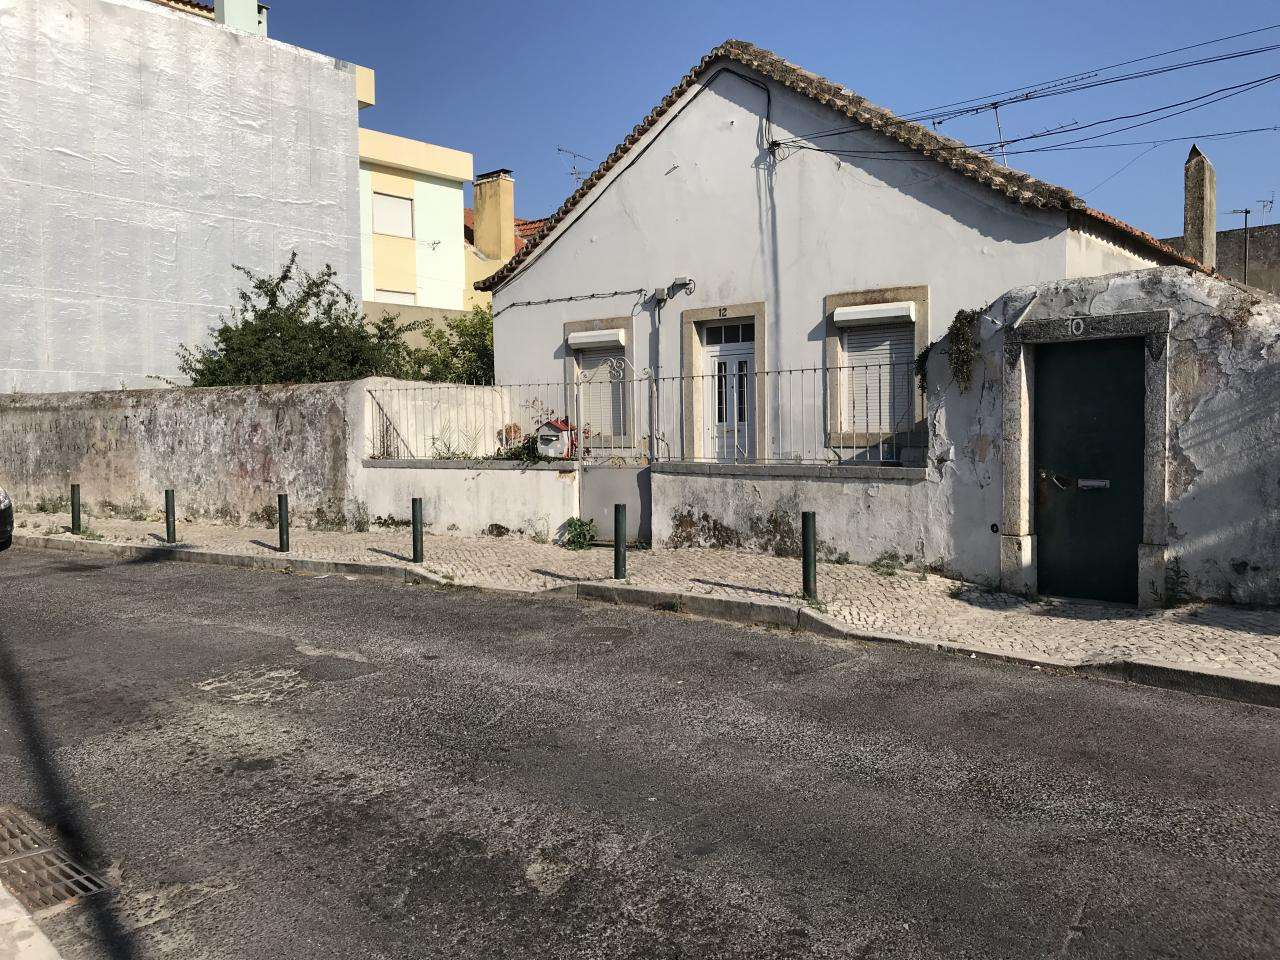 Moradia para comprar, Queluz e Belas, Sintra, Lisboa - Foto 1